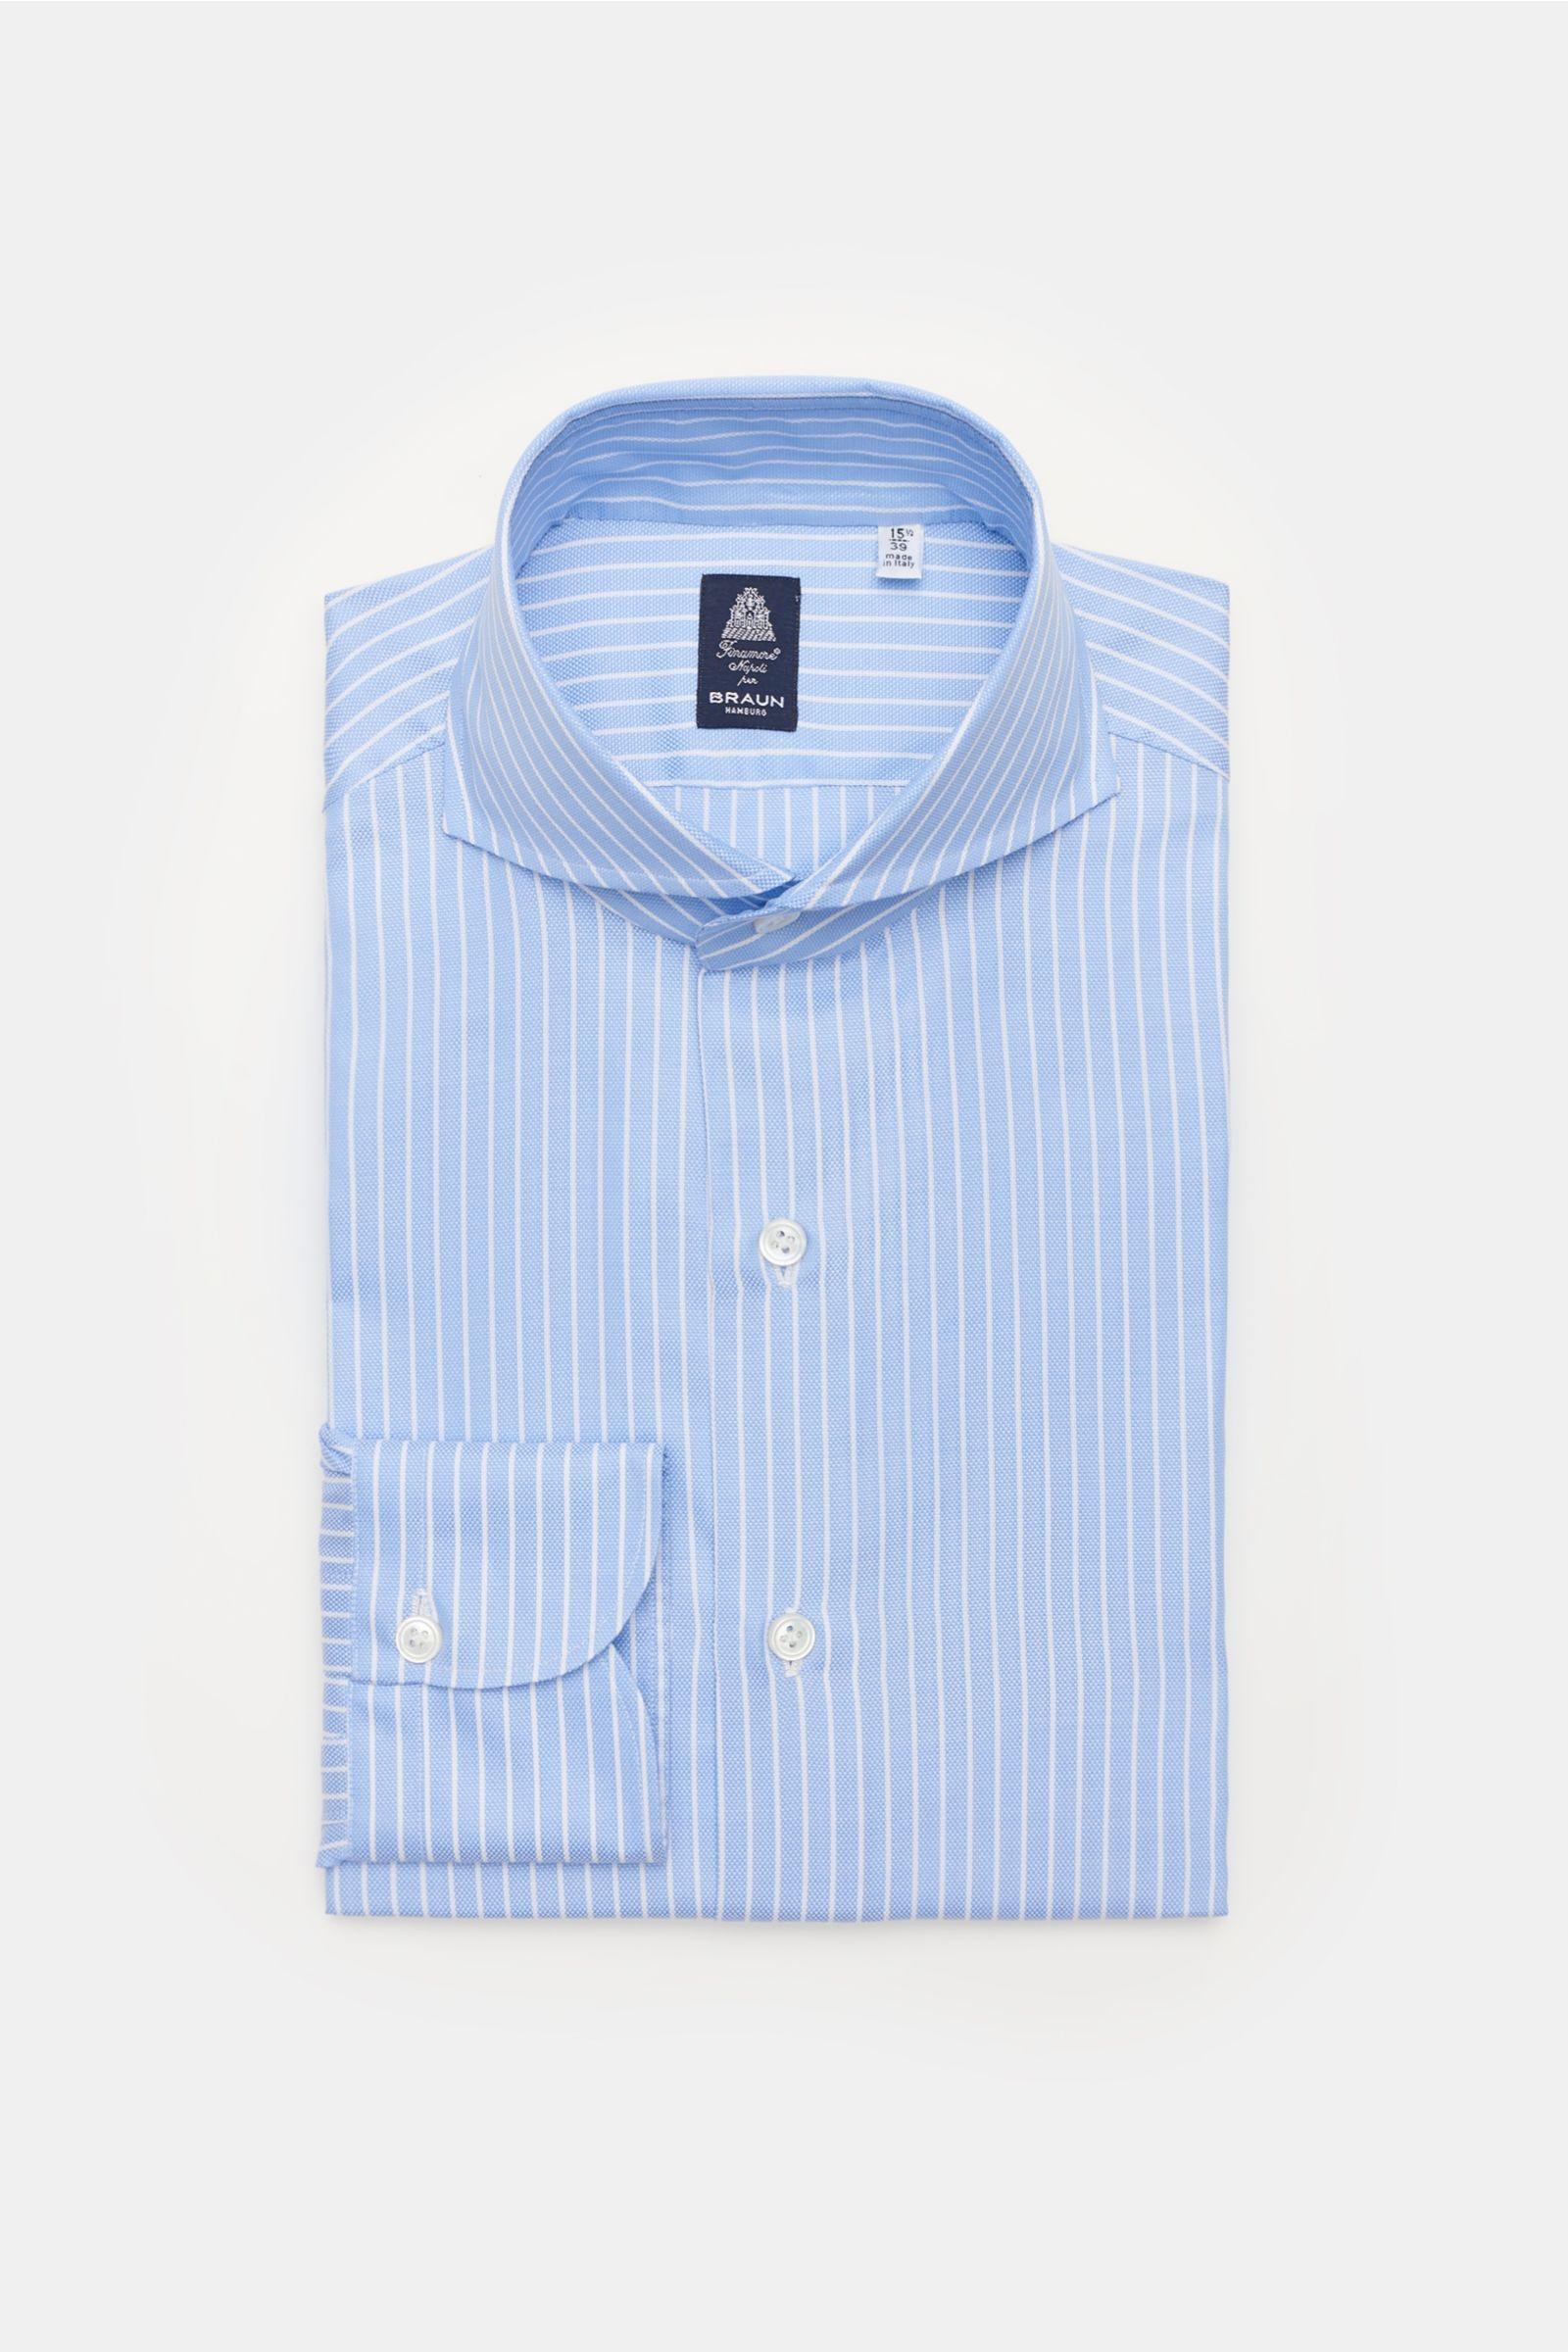 Business shirt 'Sergio Napoli' shark collar light blue/white striped